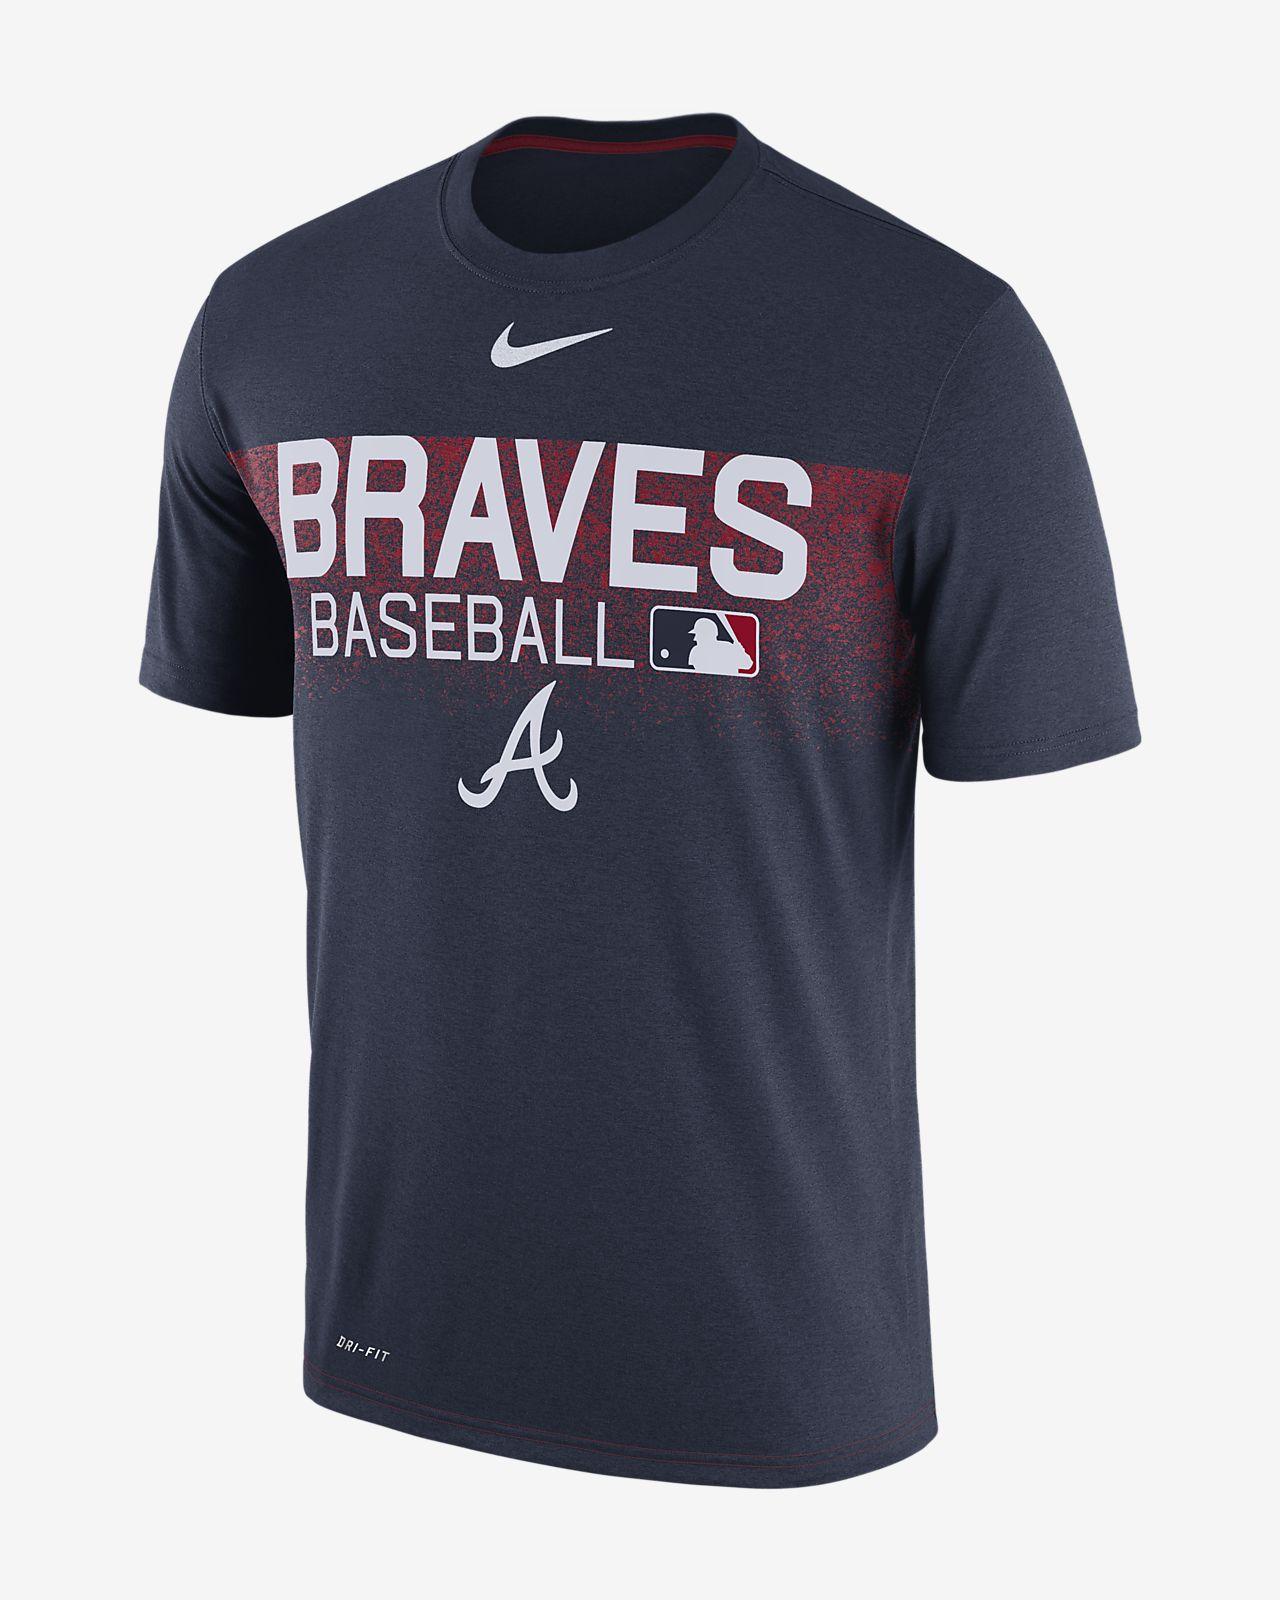 Nike Legend Team Issue (MLB Braves) Men's T-Shirts Navy